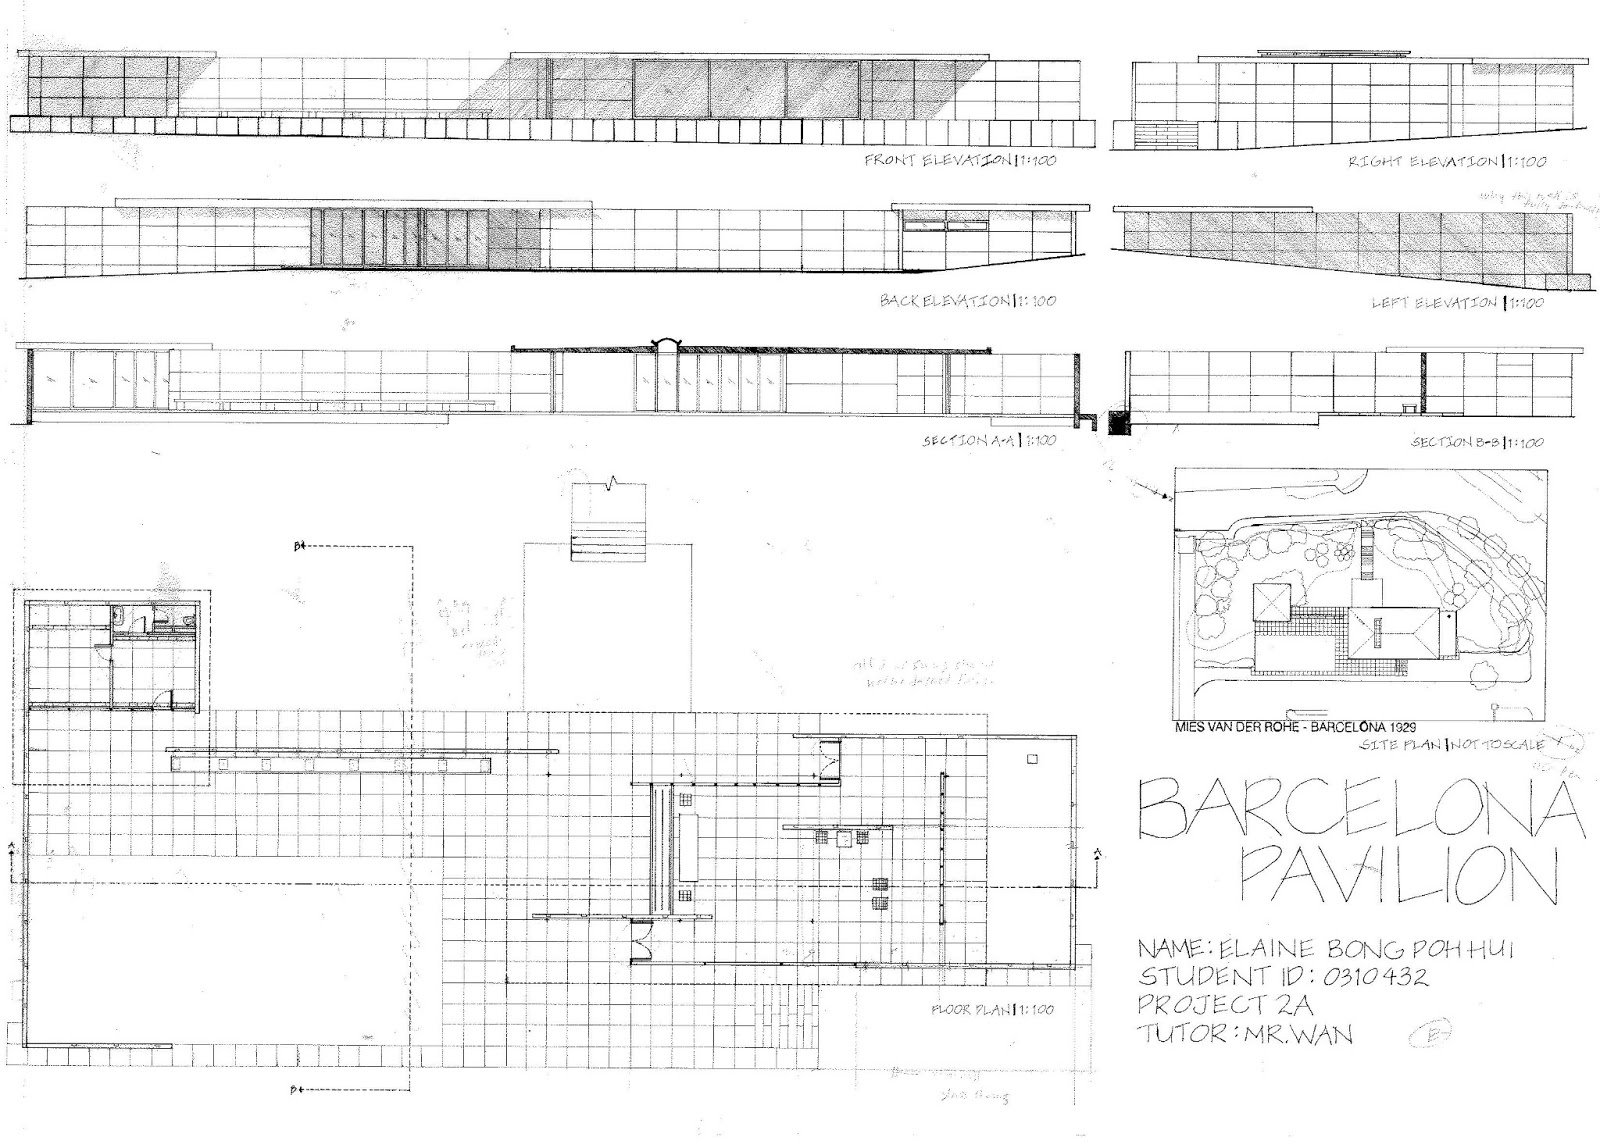 Elevation Plan Measurements : Barcelona pavilion measurements related keywords